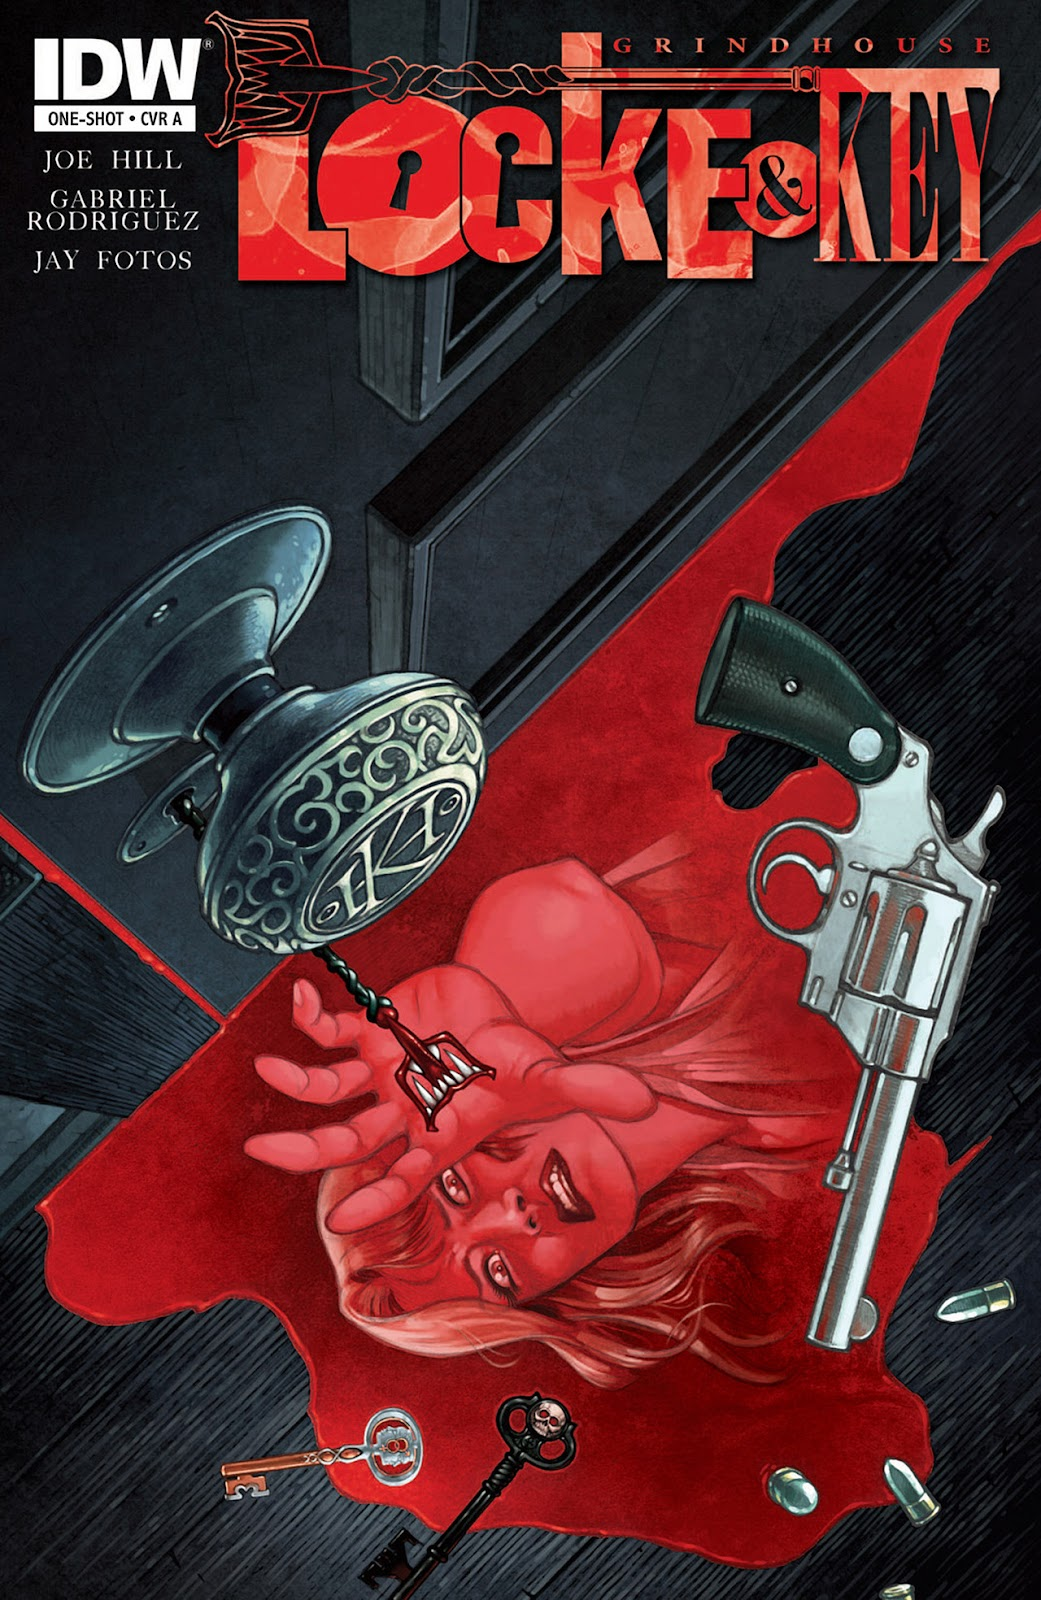 Locke & Key: Grindhouse Full Page 1